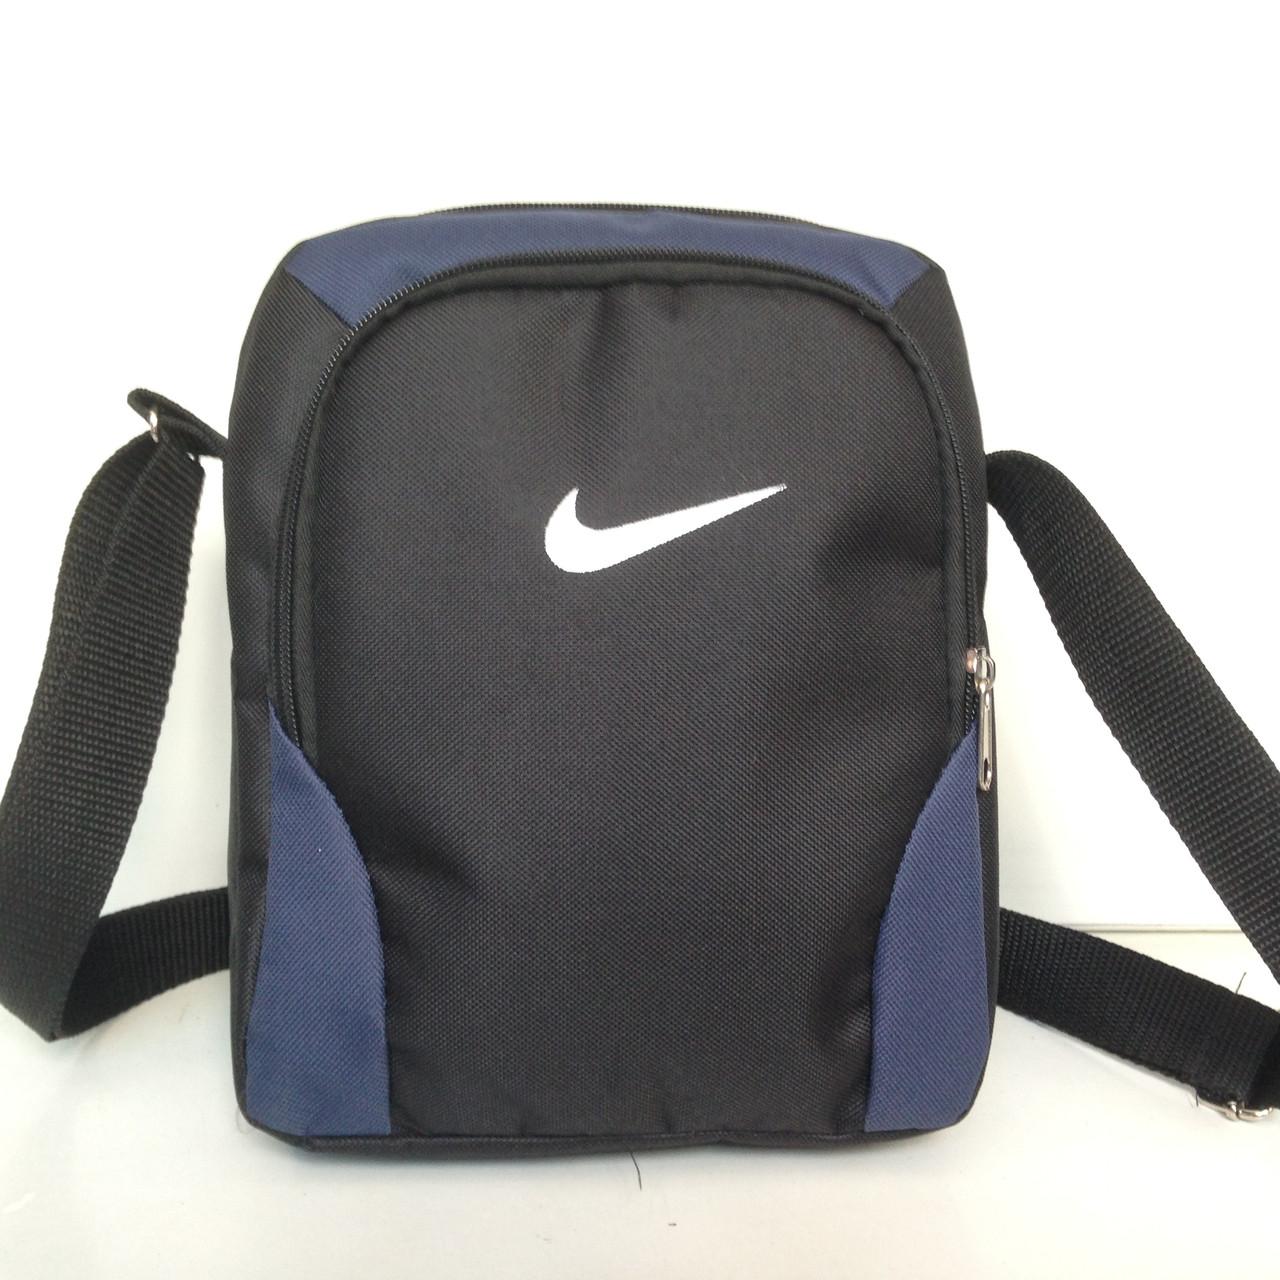 22d3f19b Сумка спортивная мужская Nike / черная: продажа, цена в Запорожье ...